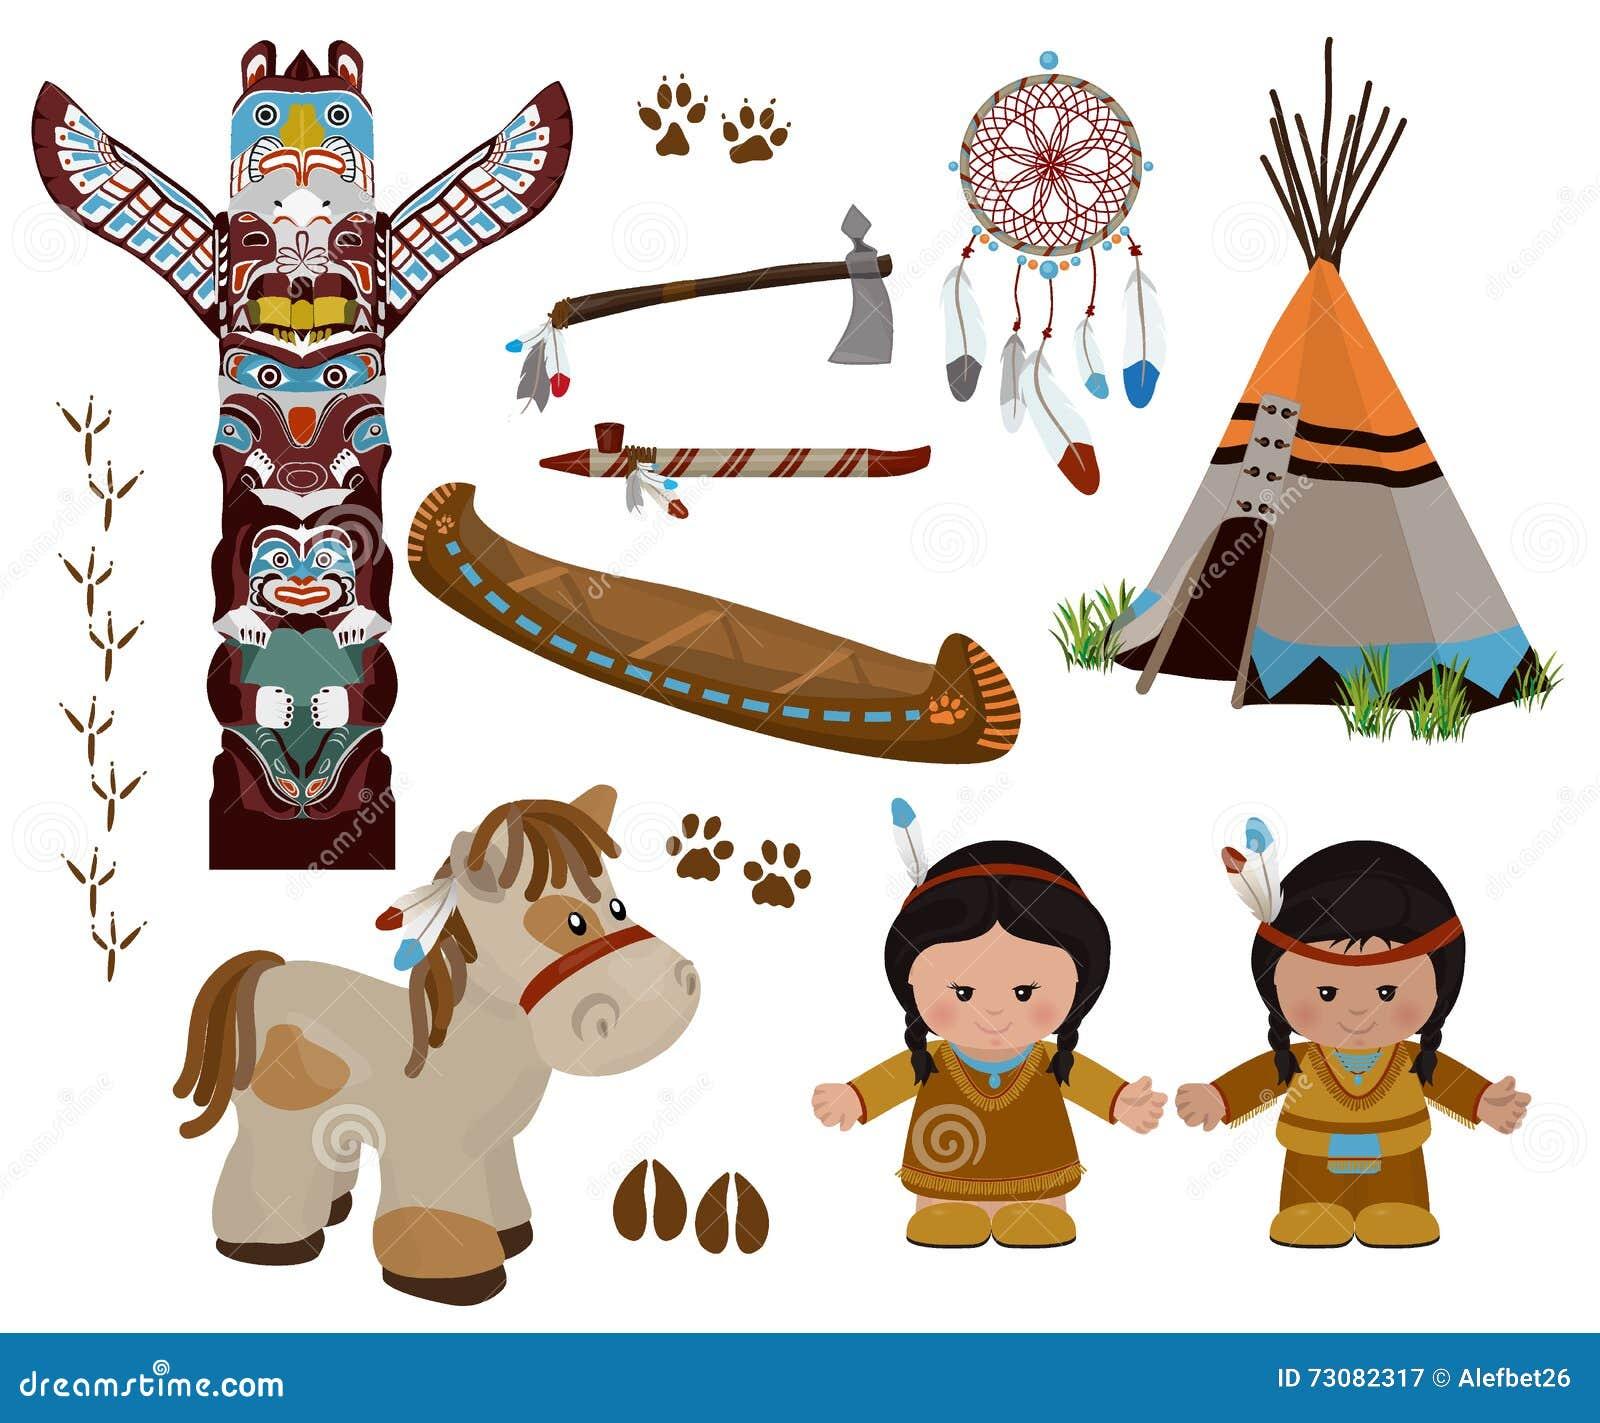 Cartoon indians tepee stock vector illustration of interior indian symbols set cartoon characters of american indians royalty free stock photography biocorpaavc